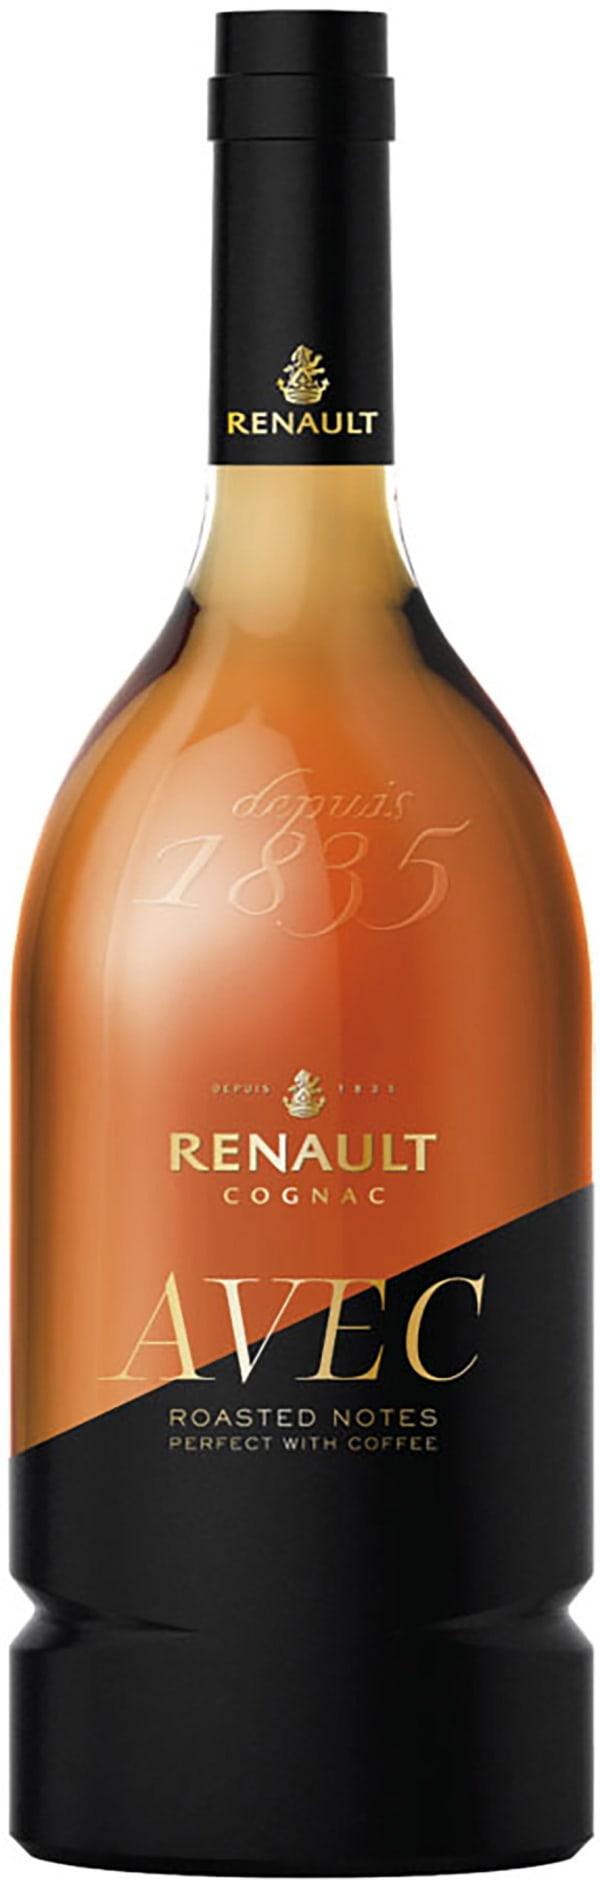 Renault Avec